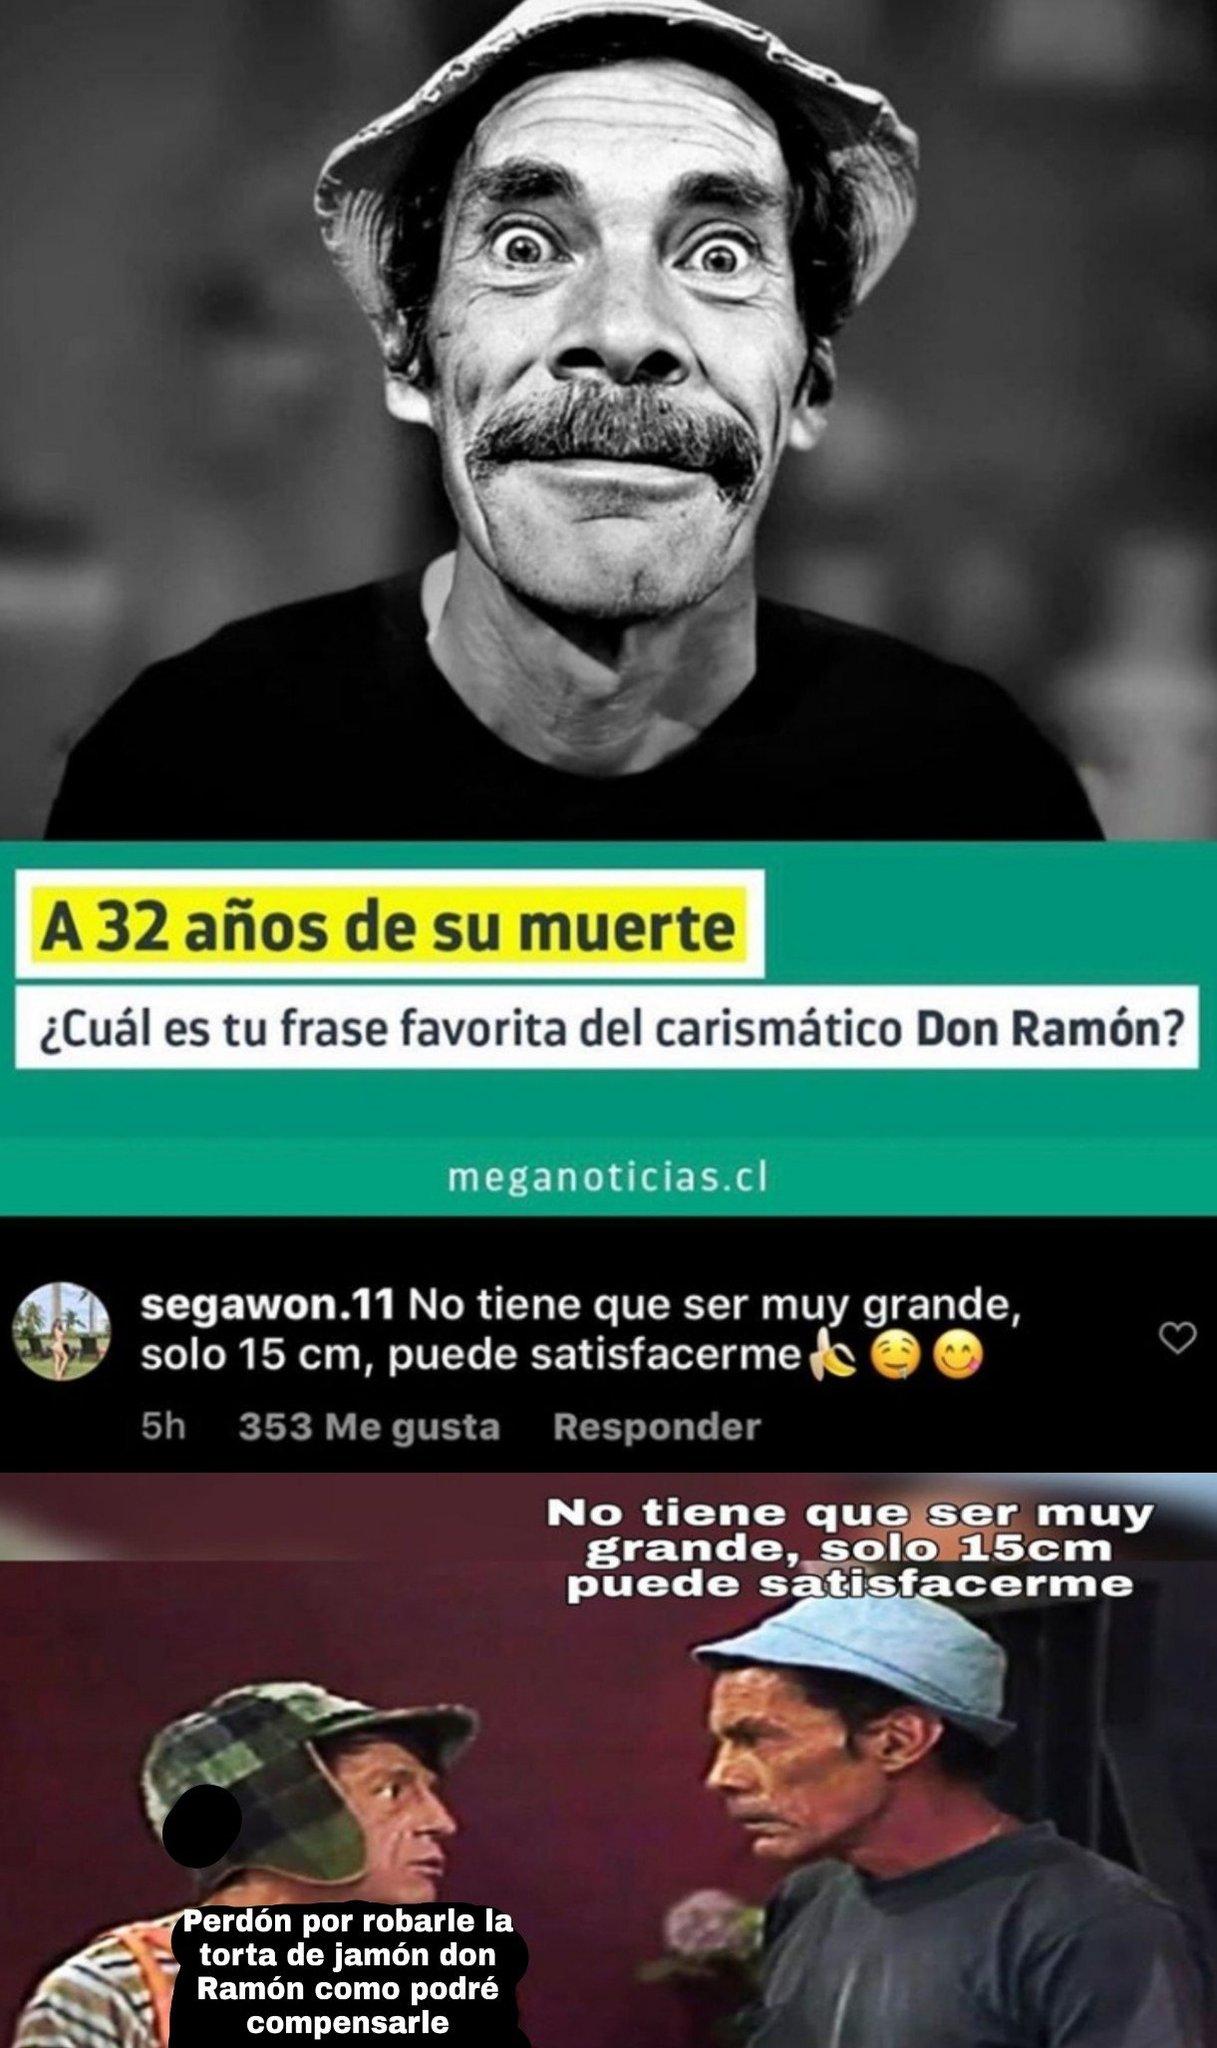 The Chad Don Ramón - meme